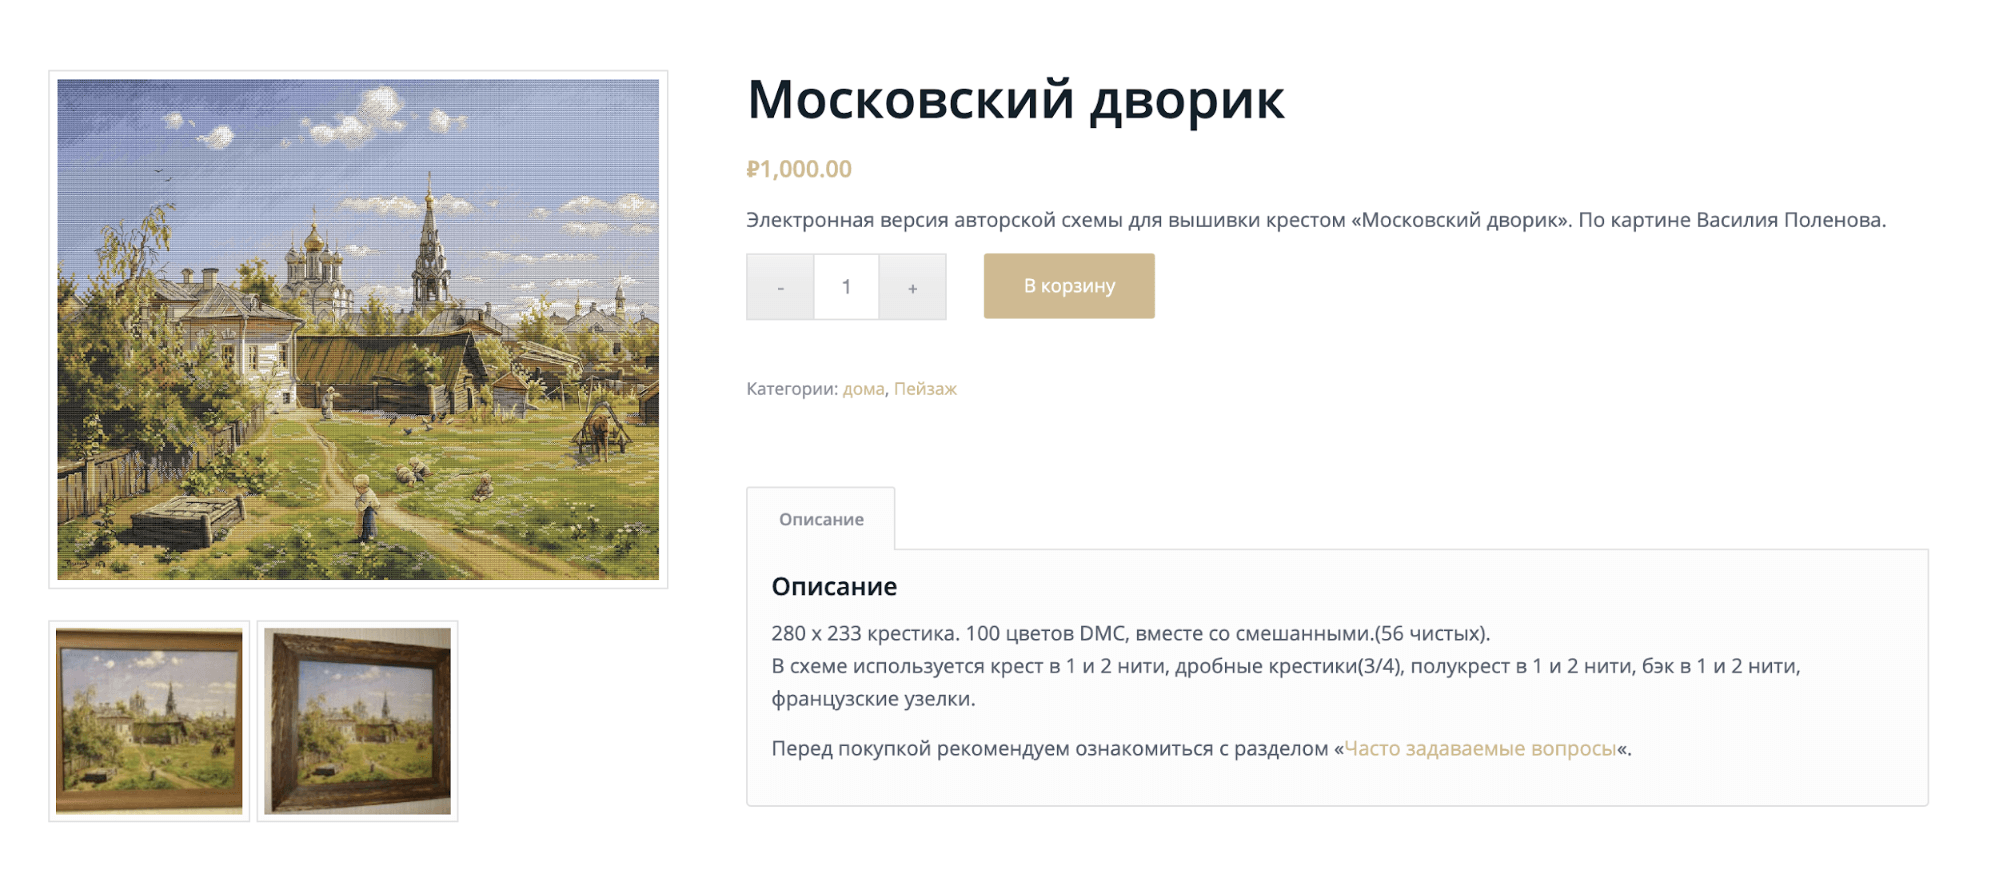 Авторская схема вышивки «Московский дворик» за 1000<span class=ruble>Р</span>